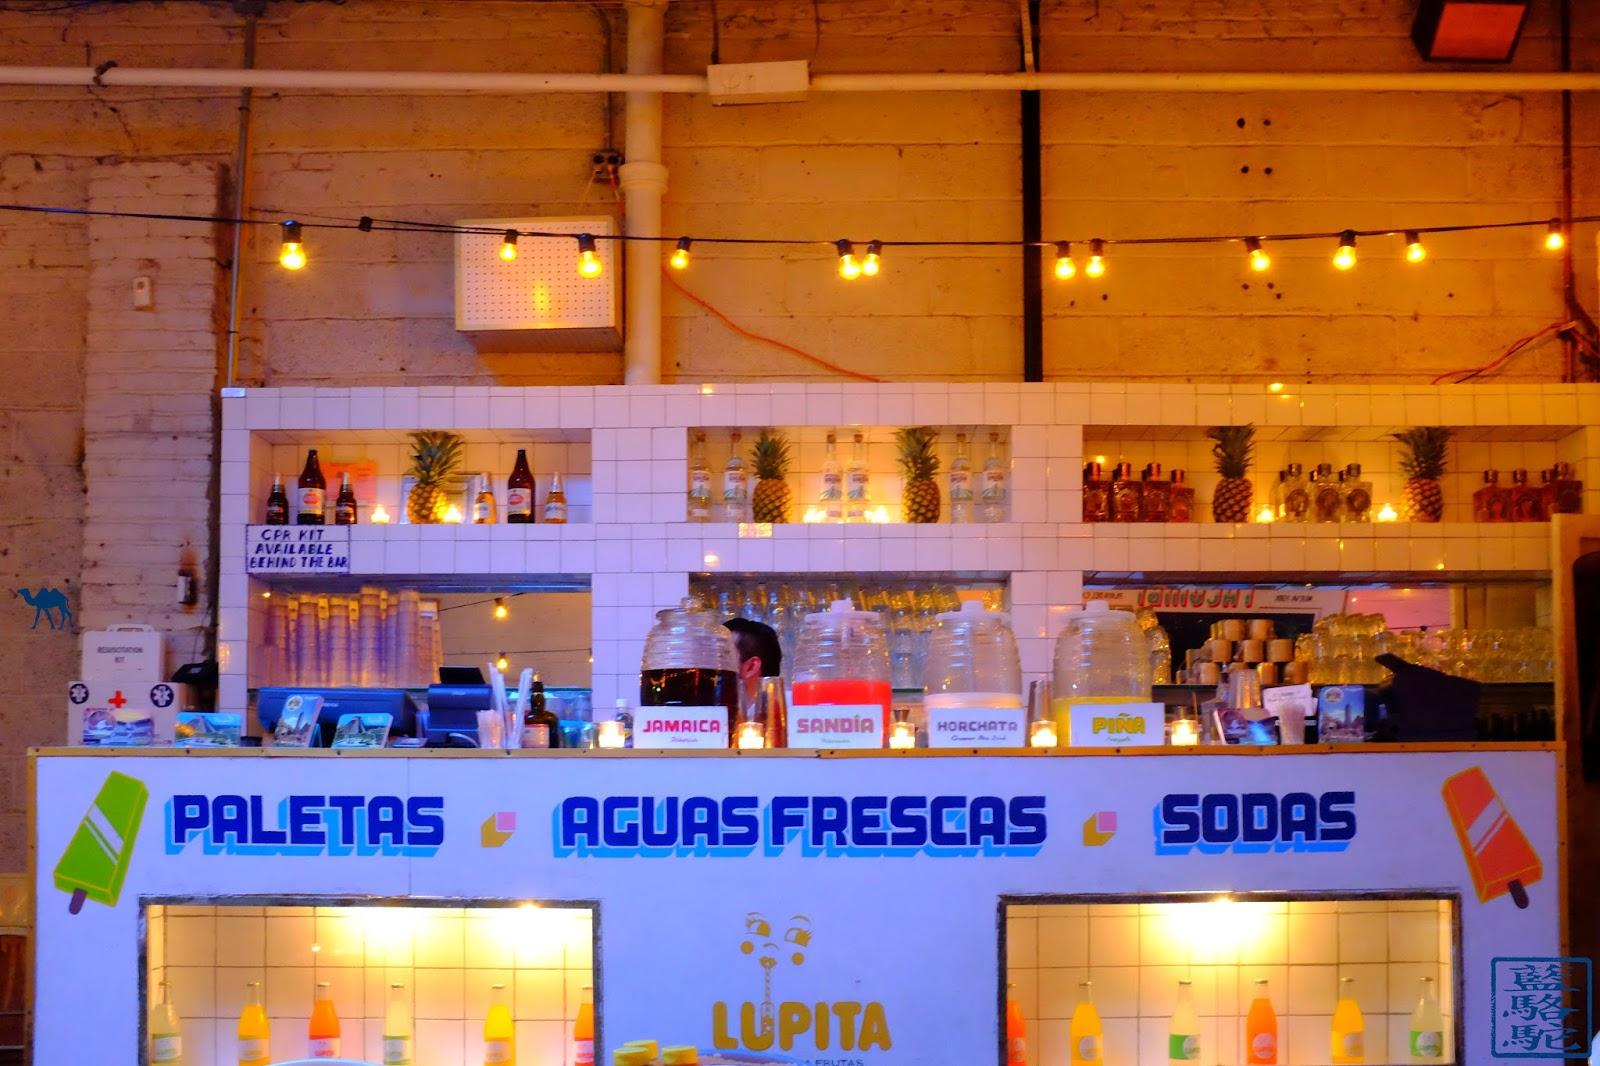 Le Chameau Bleu - Blog Voyage New York City - Tacombi - Bar - Tacos Mexicain à New York  USA